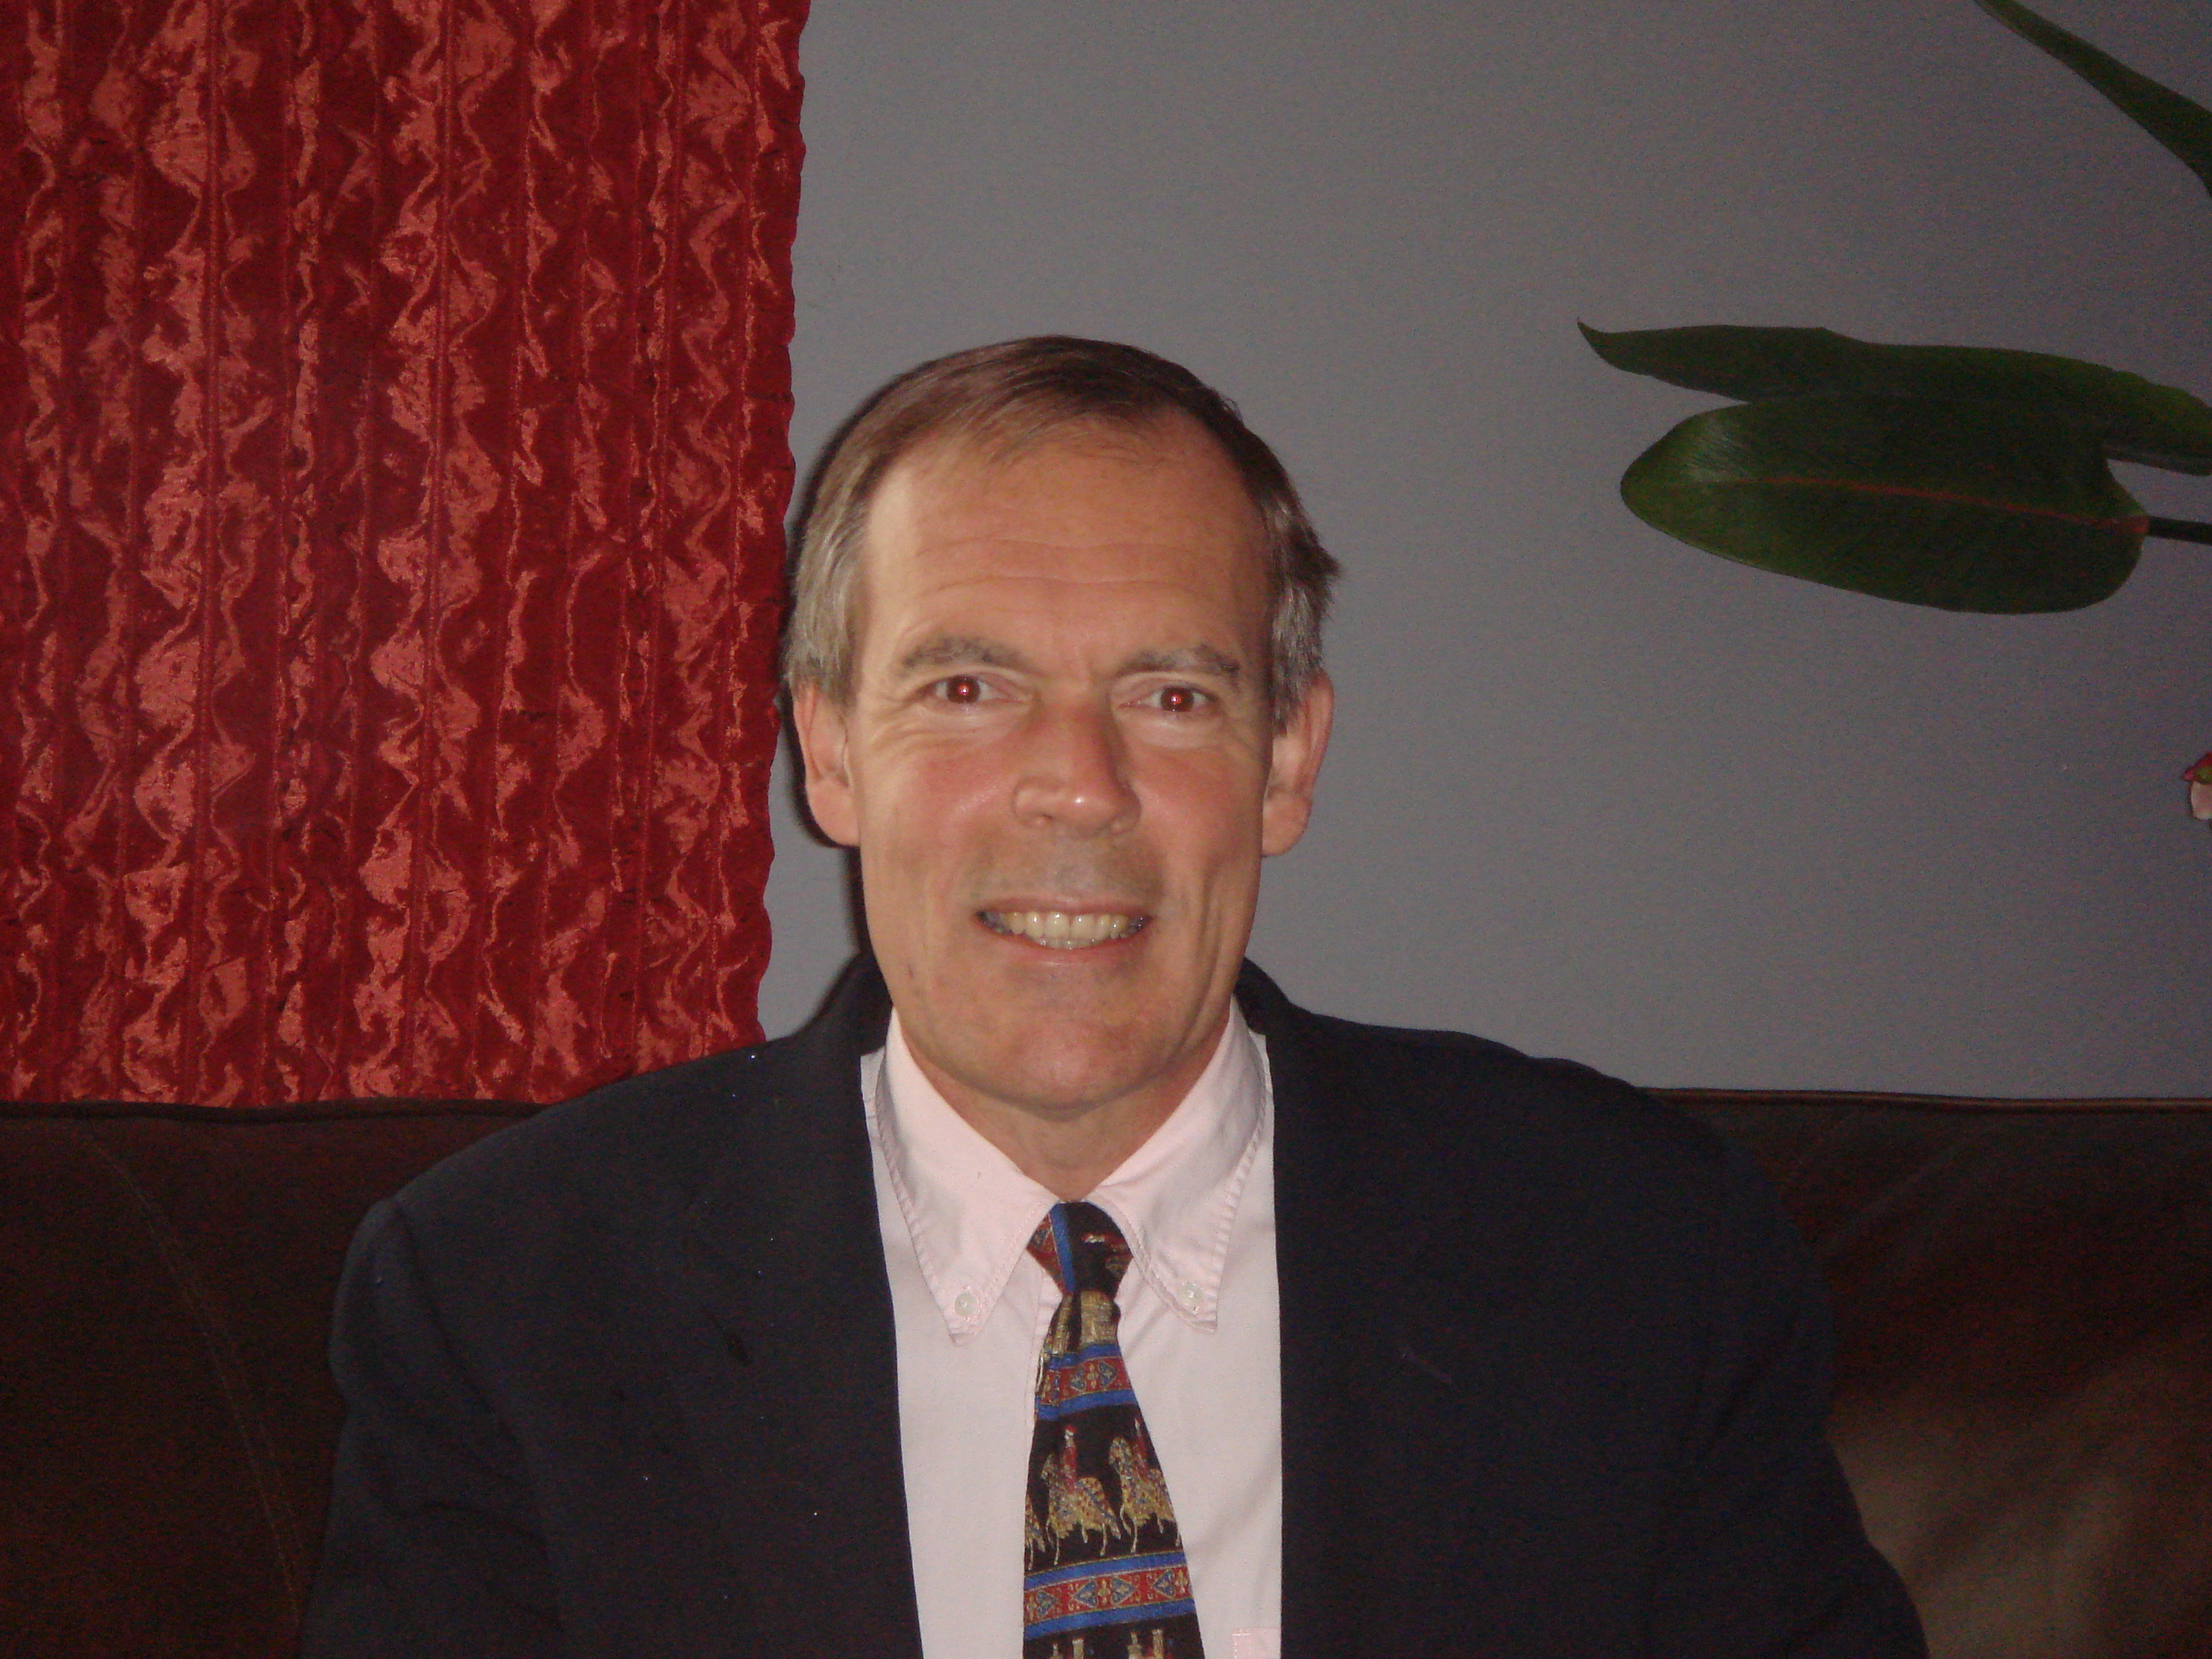 Bill insurance photo